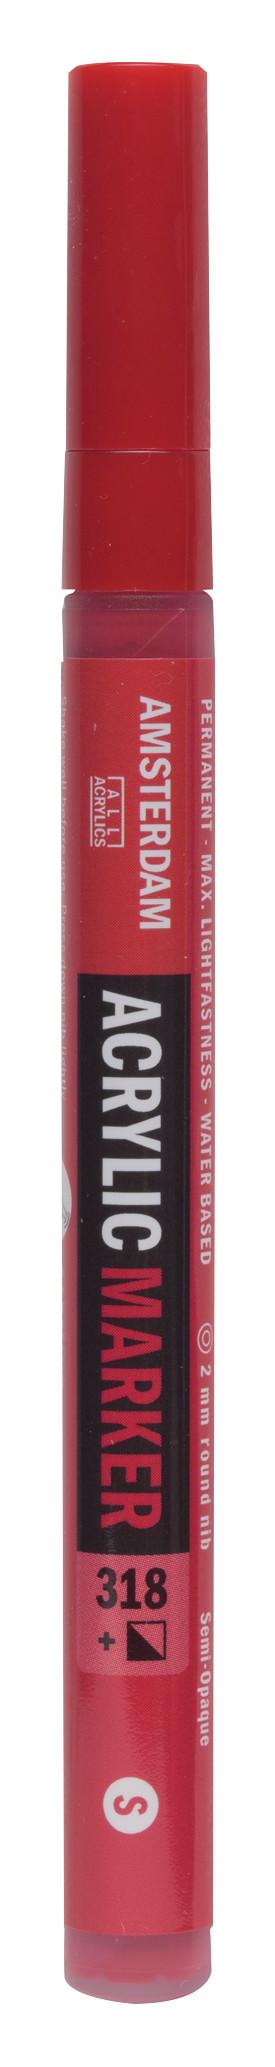 Amsterdam Acrylic Marker 2 mm Carmine 318